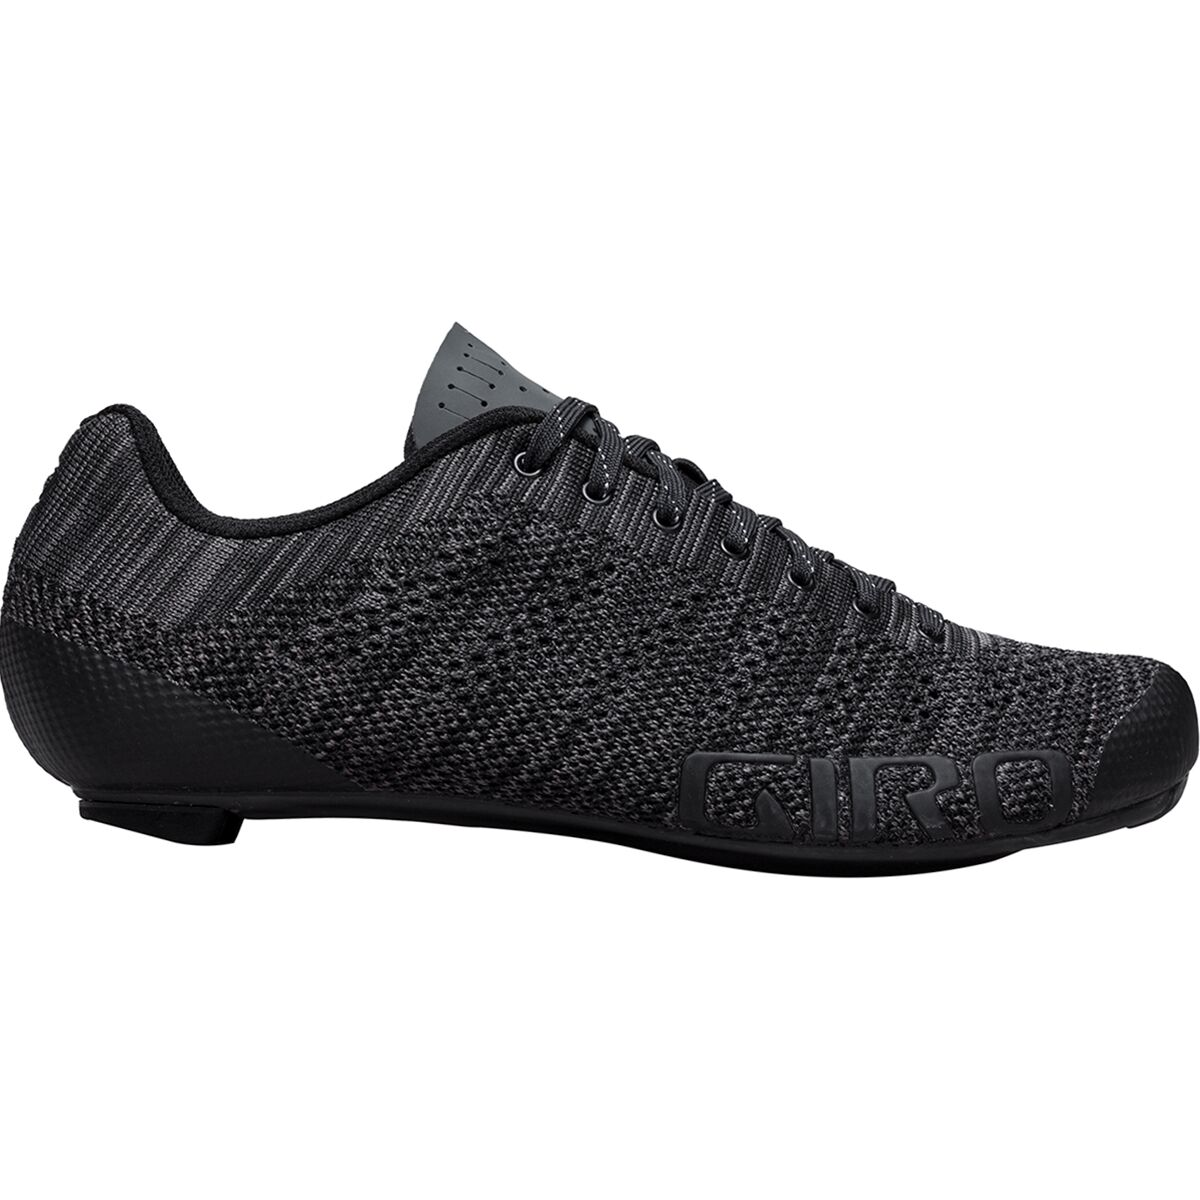 Giro Empire E70 Knit Shoe - Men's Black/Charcoal Heather, 43.5 GIR00GF-BLAHE-S435